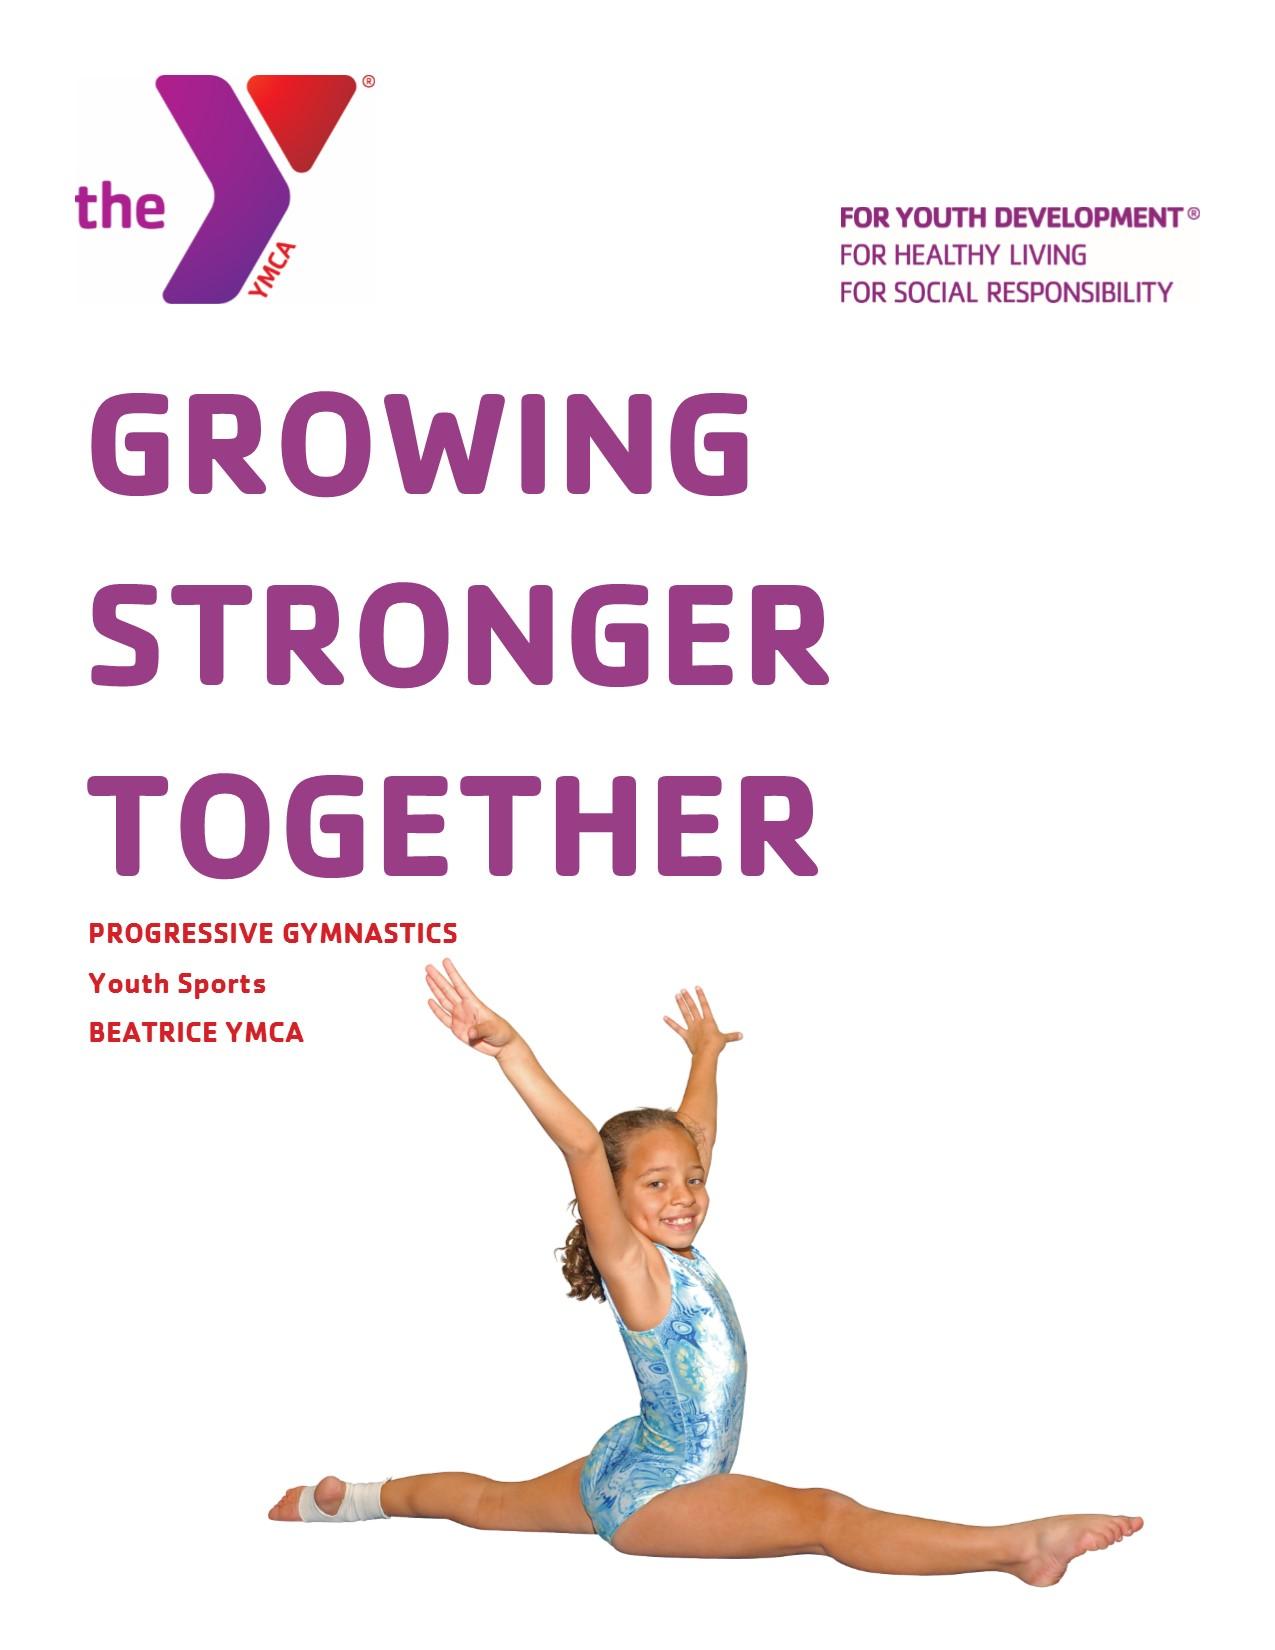 Ymca Youth Development